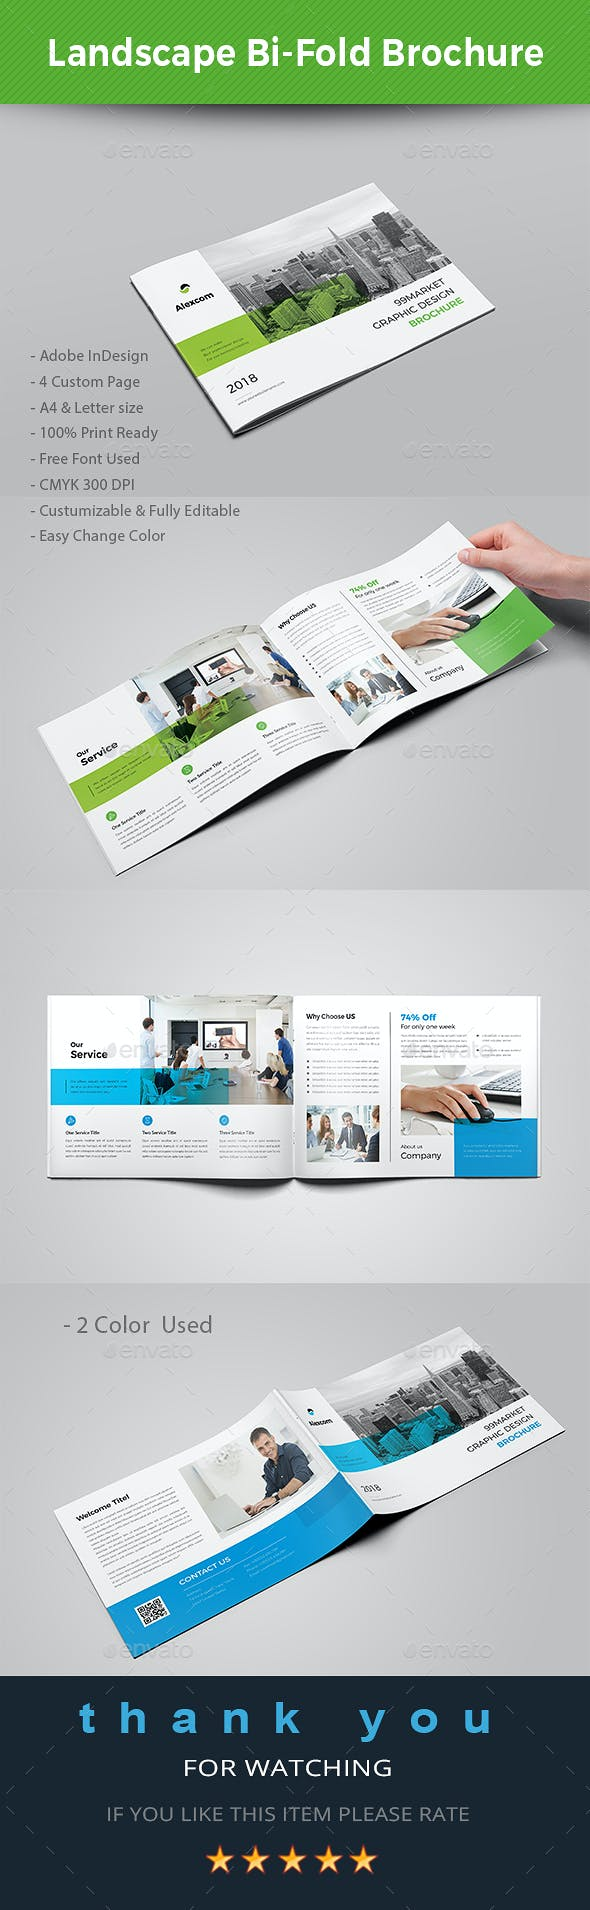 Landscape Bi-fold Brochure